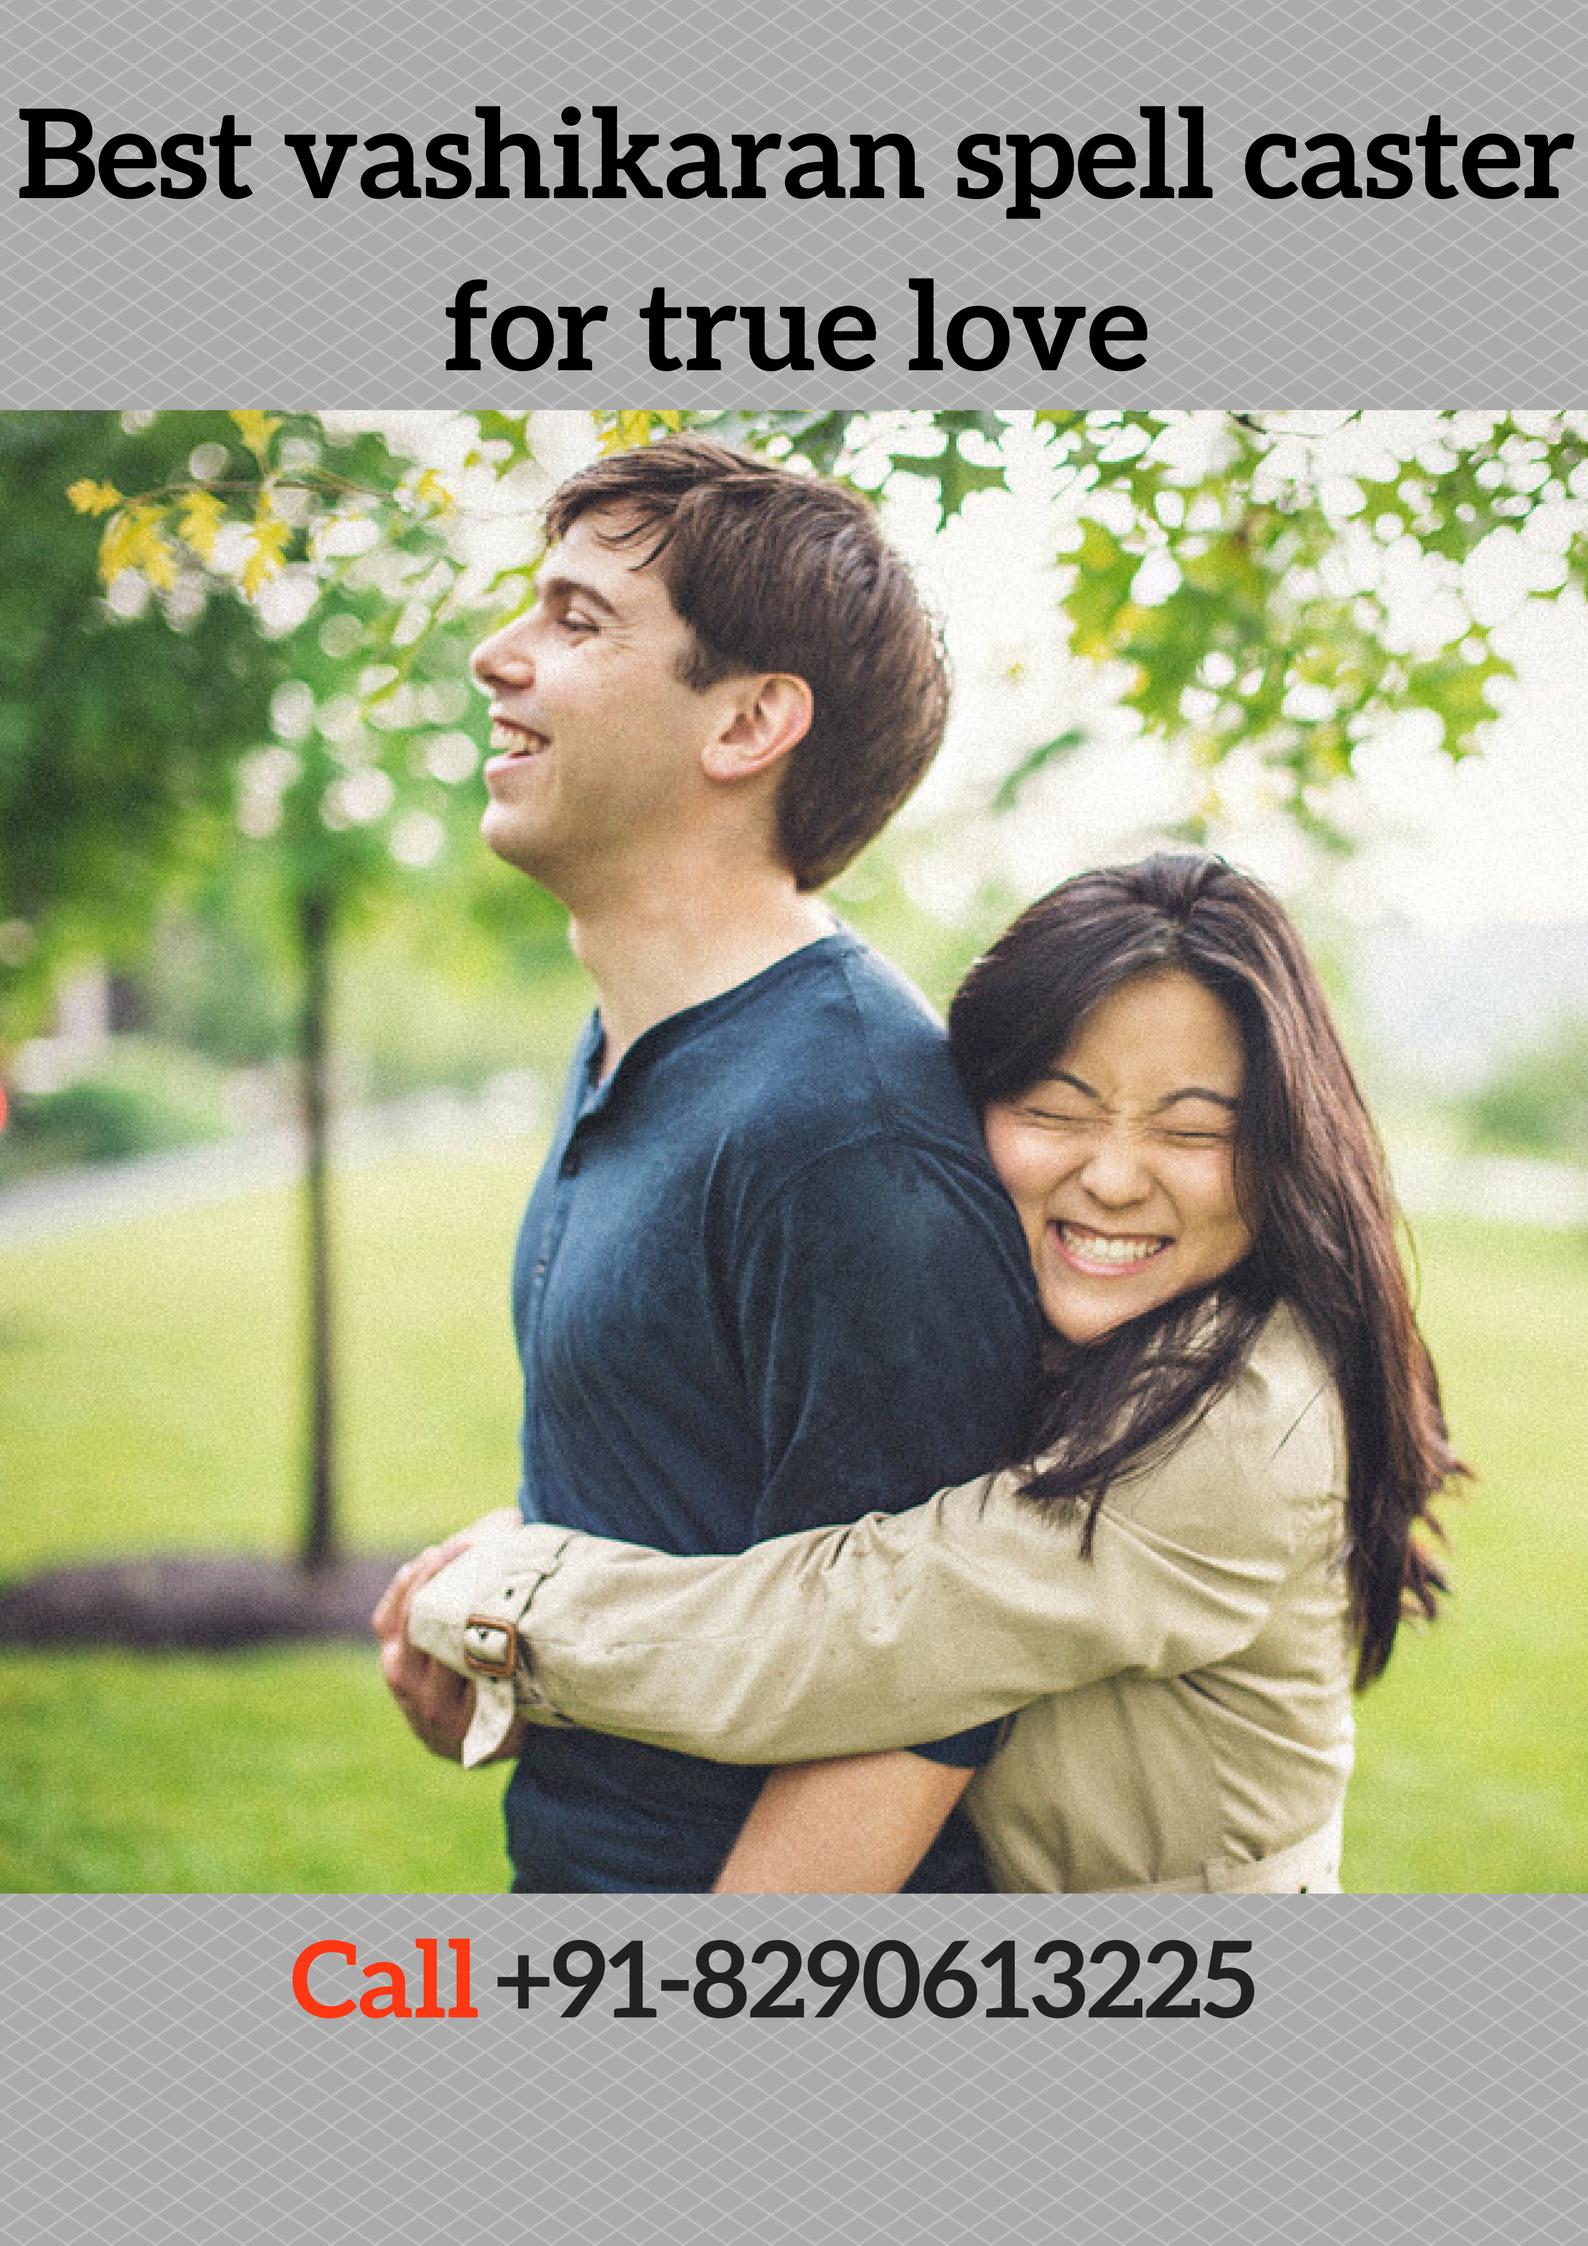 Best Vashikaran Spell Caster for True Love in Chennai - +91